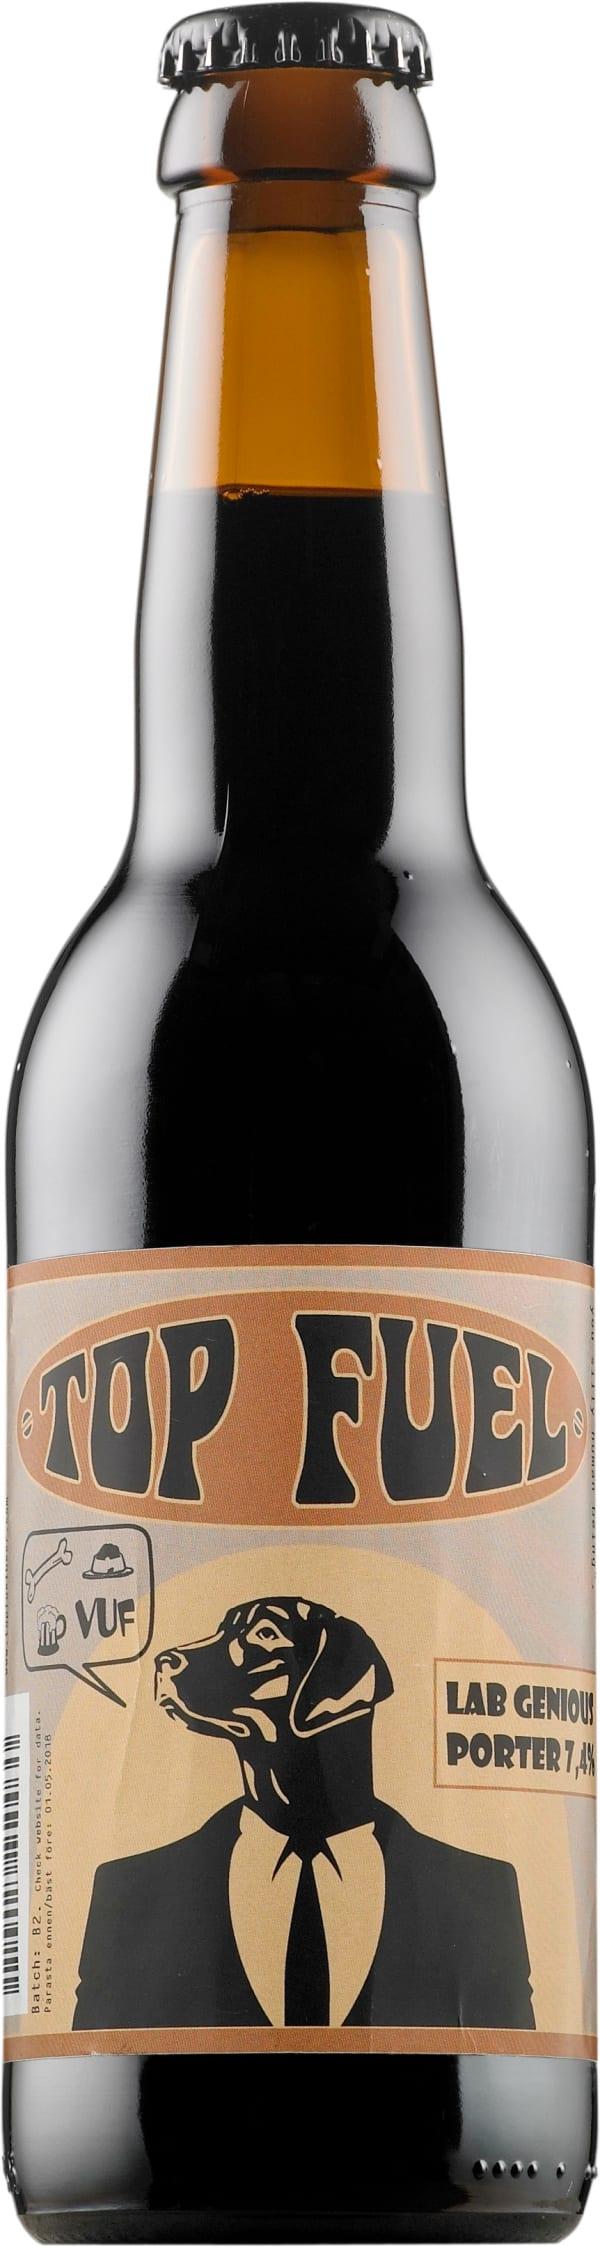 Top Fuel Lab Genious Porter